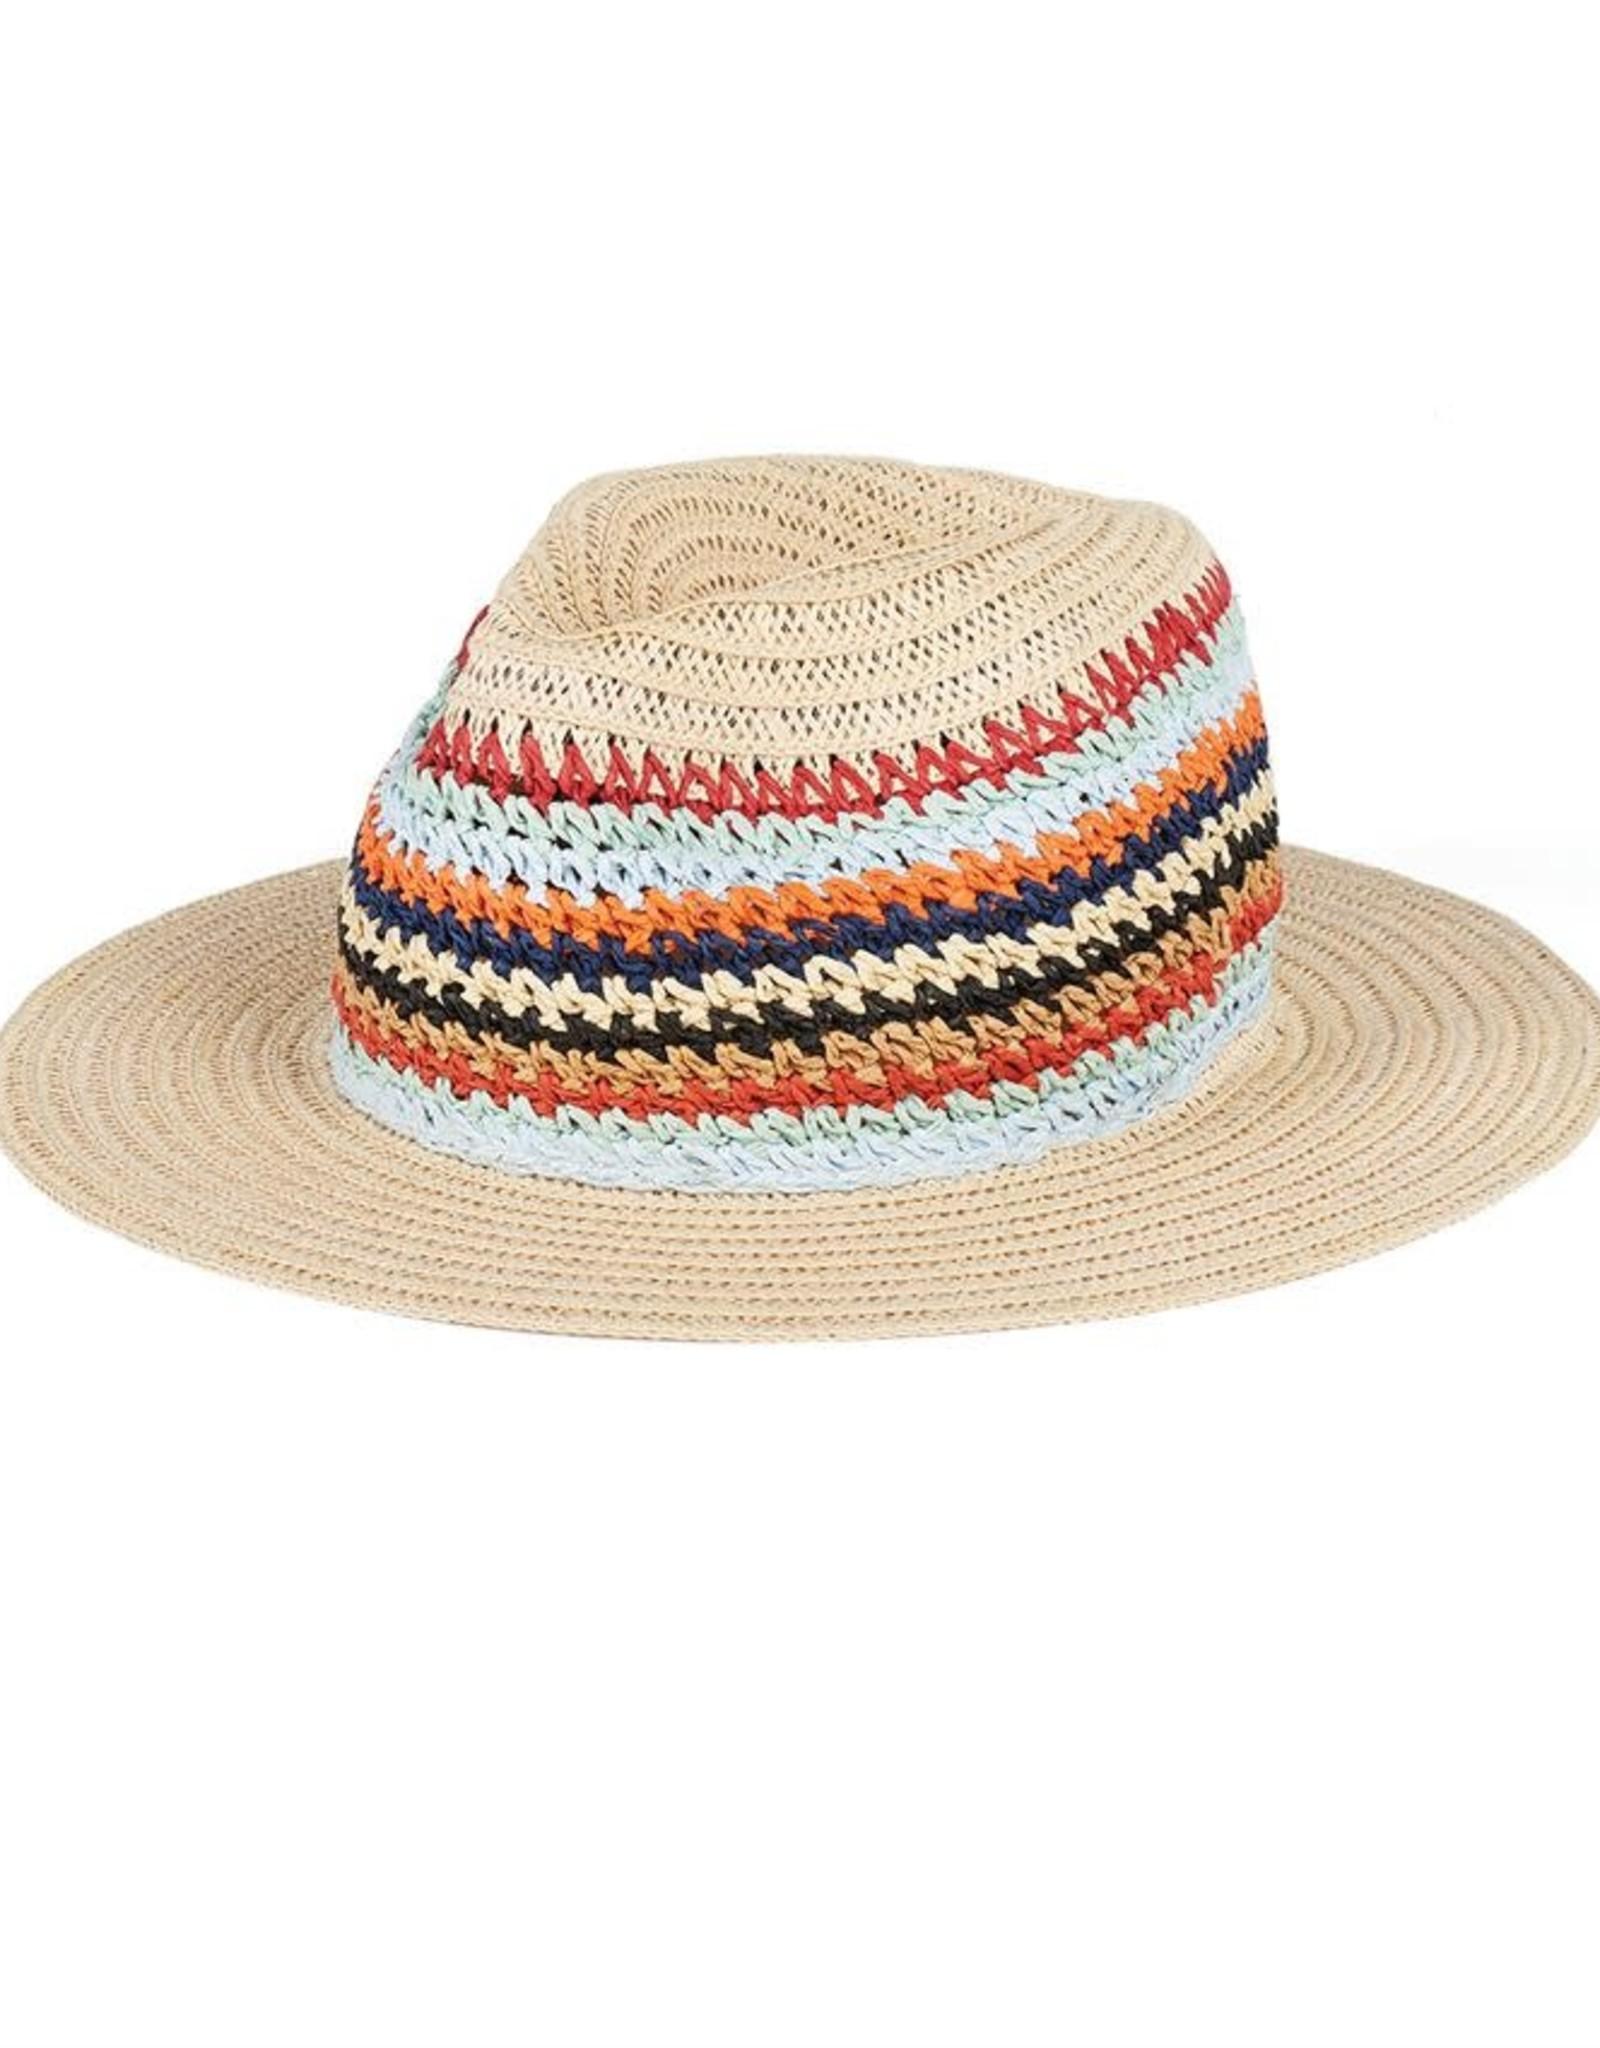 Coco & Carmen Blooming Camila Ranch Hat